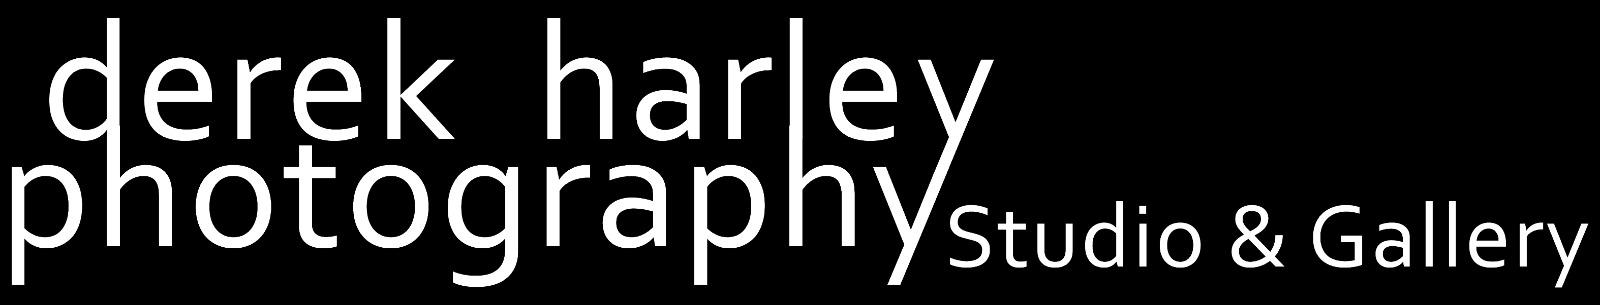 Derek Harley Photography